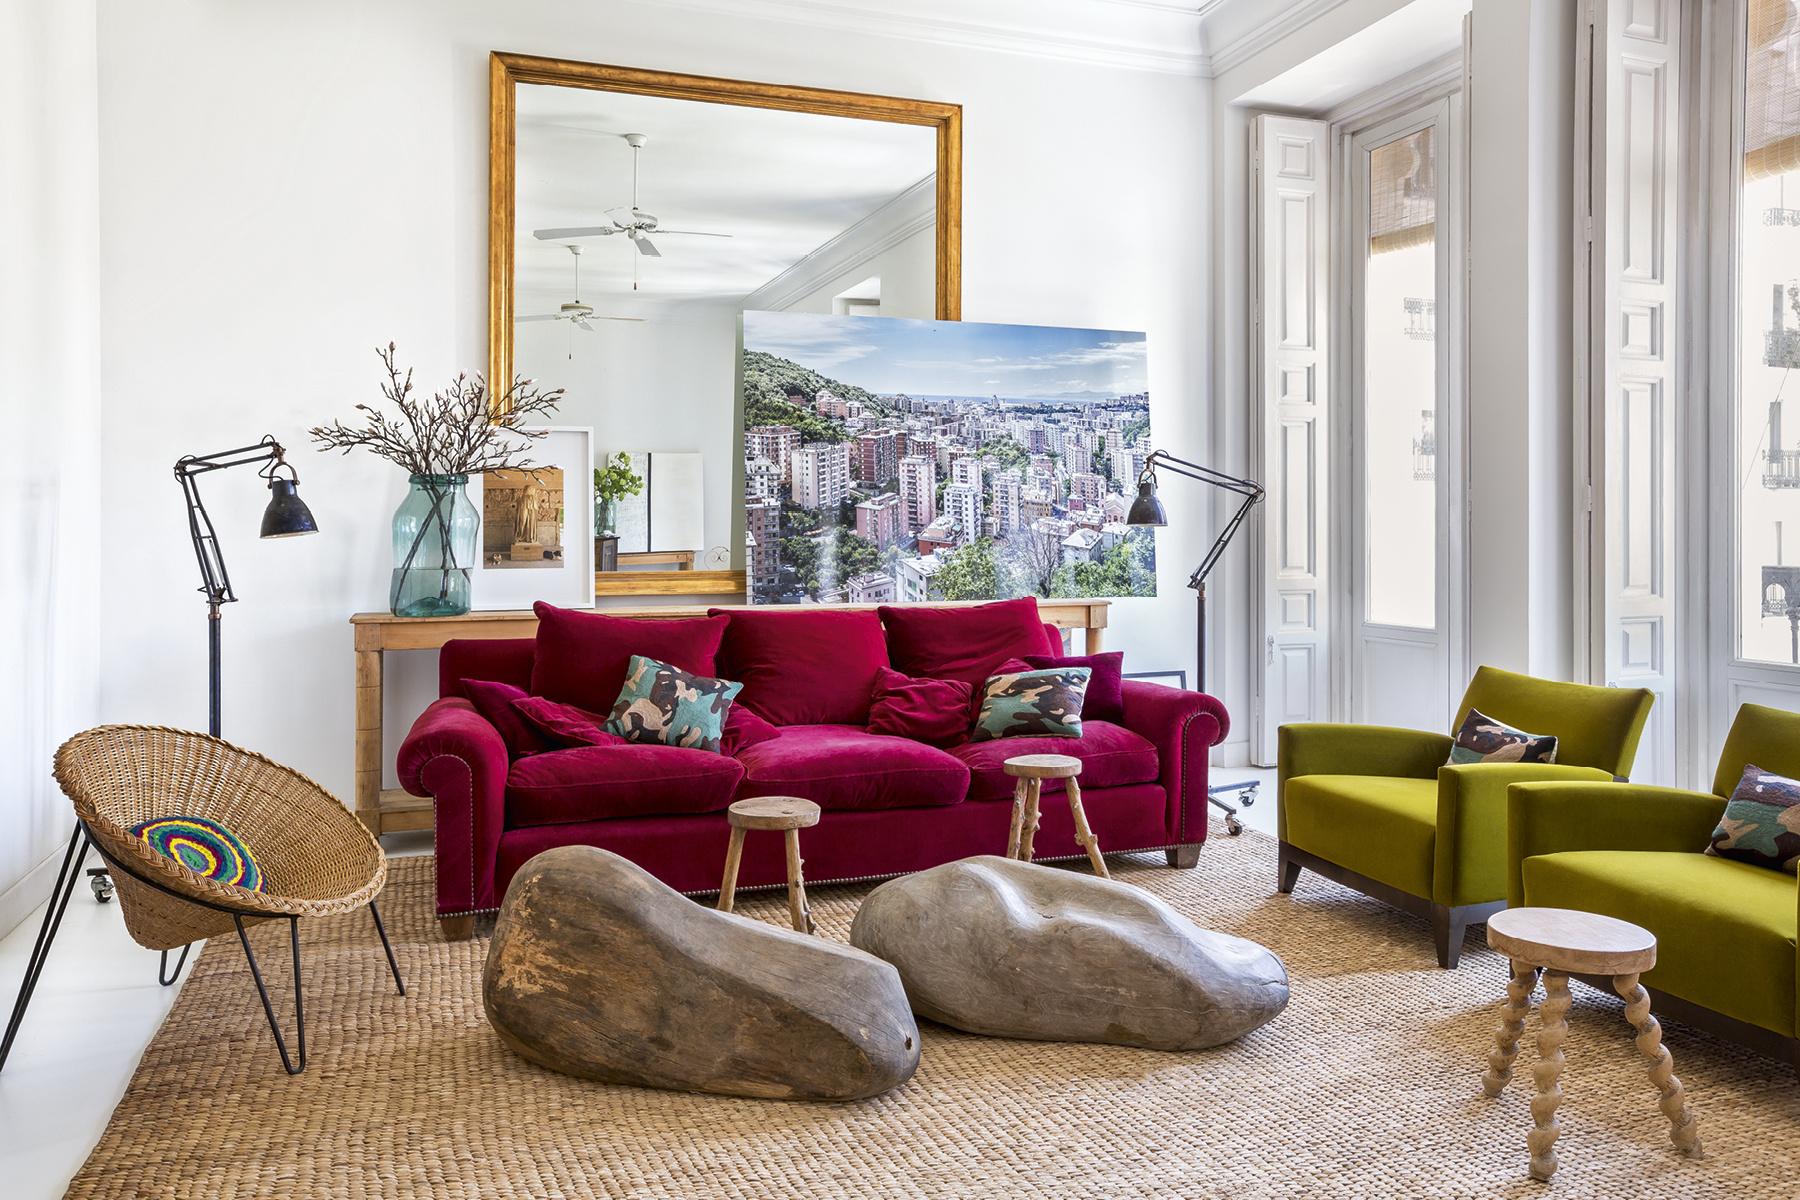 7 casa_de_luis_galliussi_en_madrid_ad spain interior design home decor ideas vintage boho style kolorowe mieszkanie styl vintage wnetrza